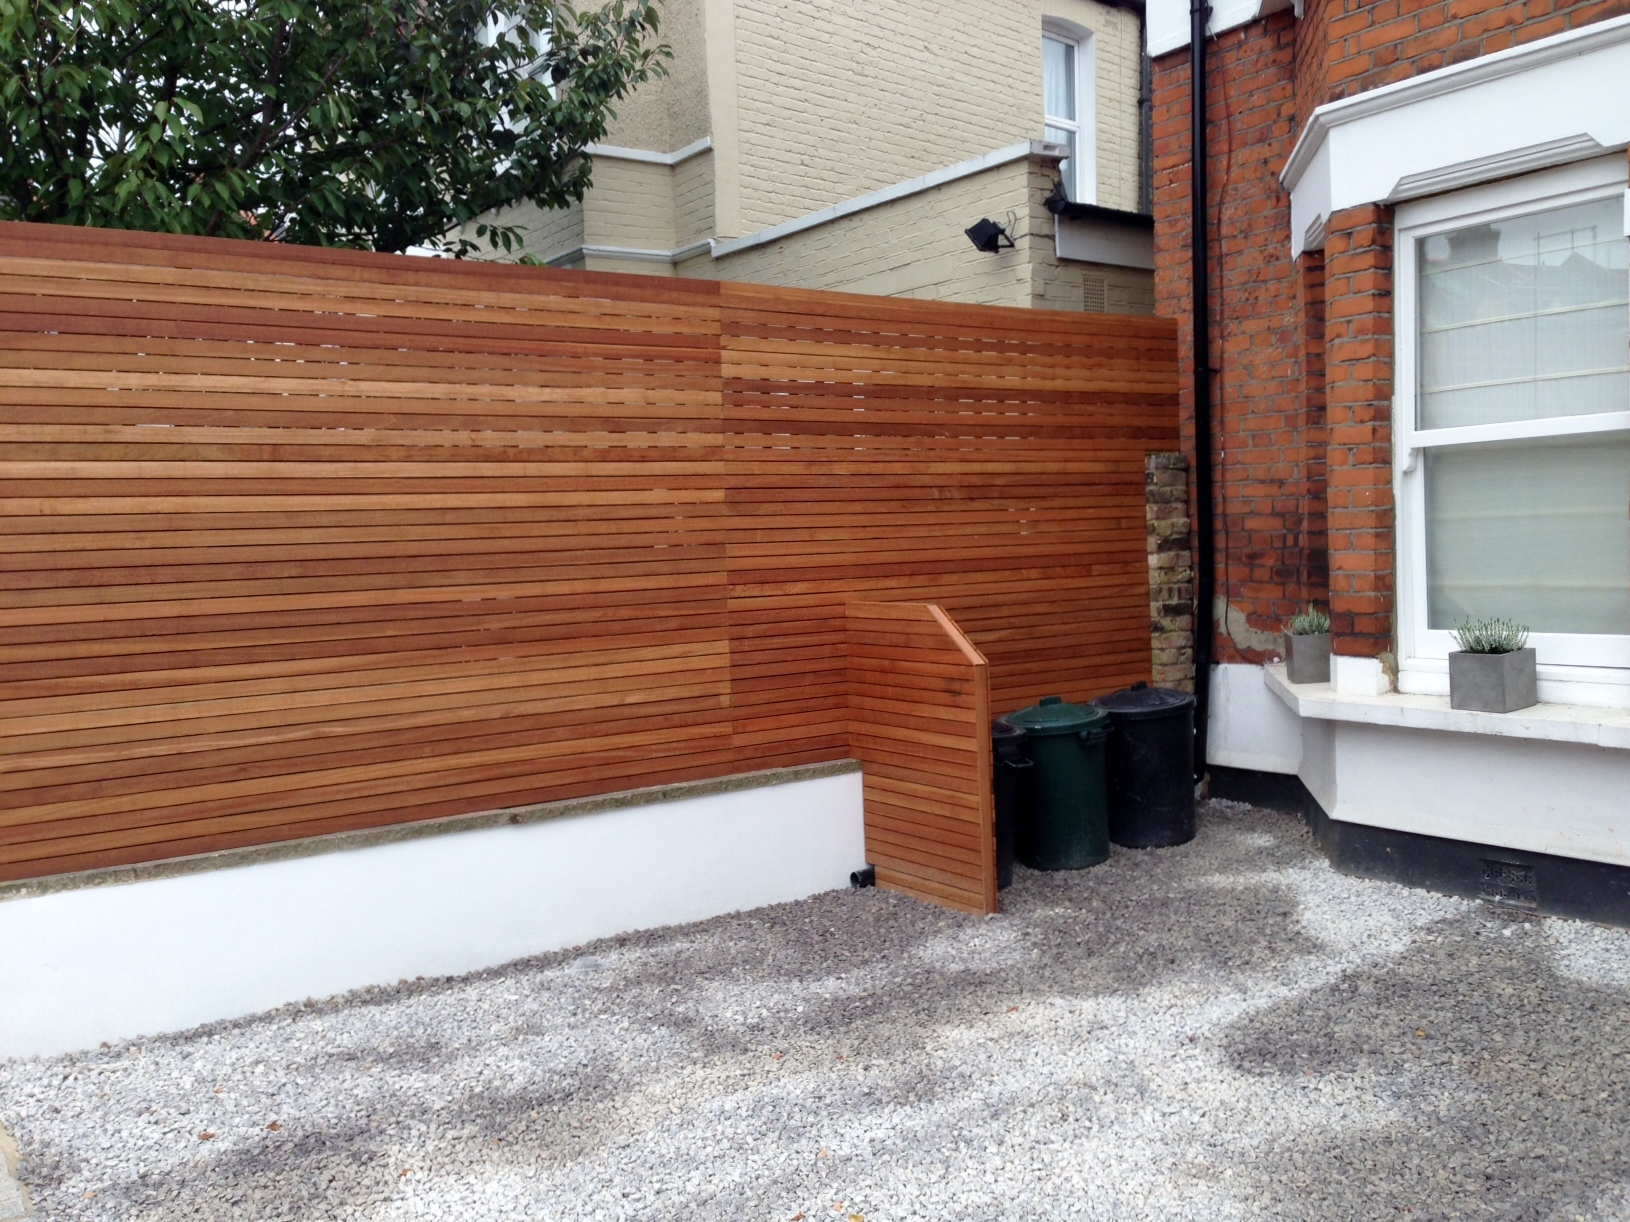 front garden drivewat gravel travertine paving path hardwood privacy screen trellis tooting london (5)